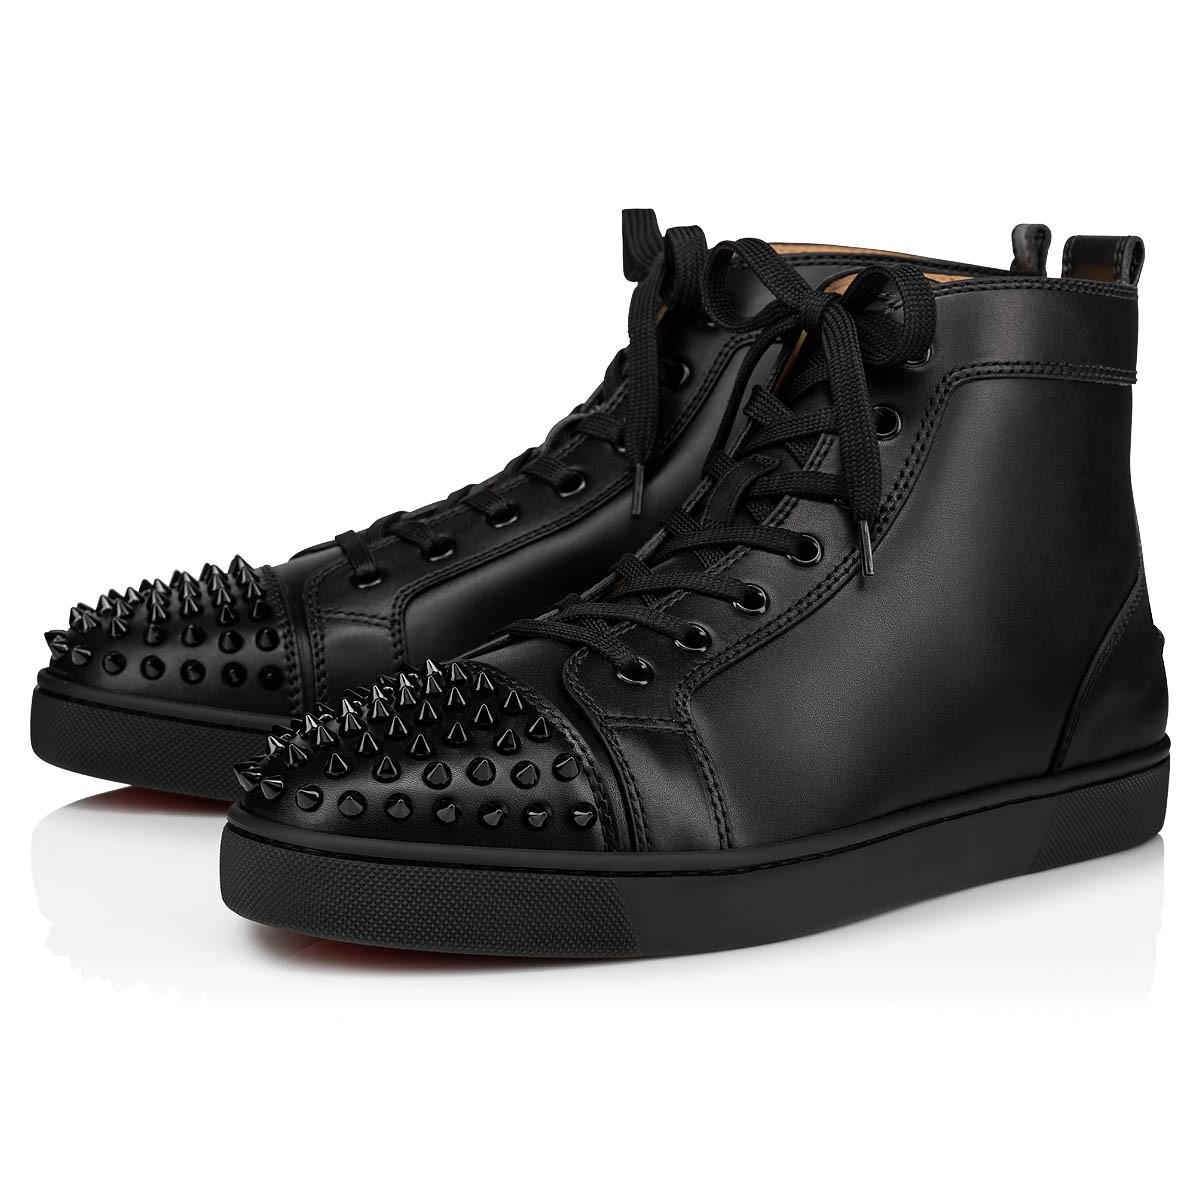 Shoes - Lou Spikes - Christian Louboutin